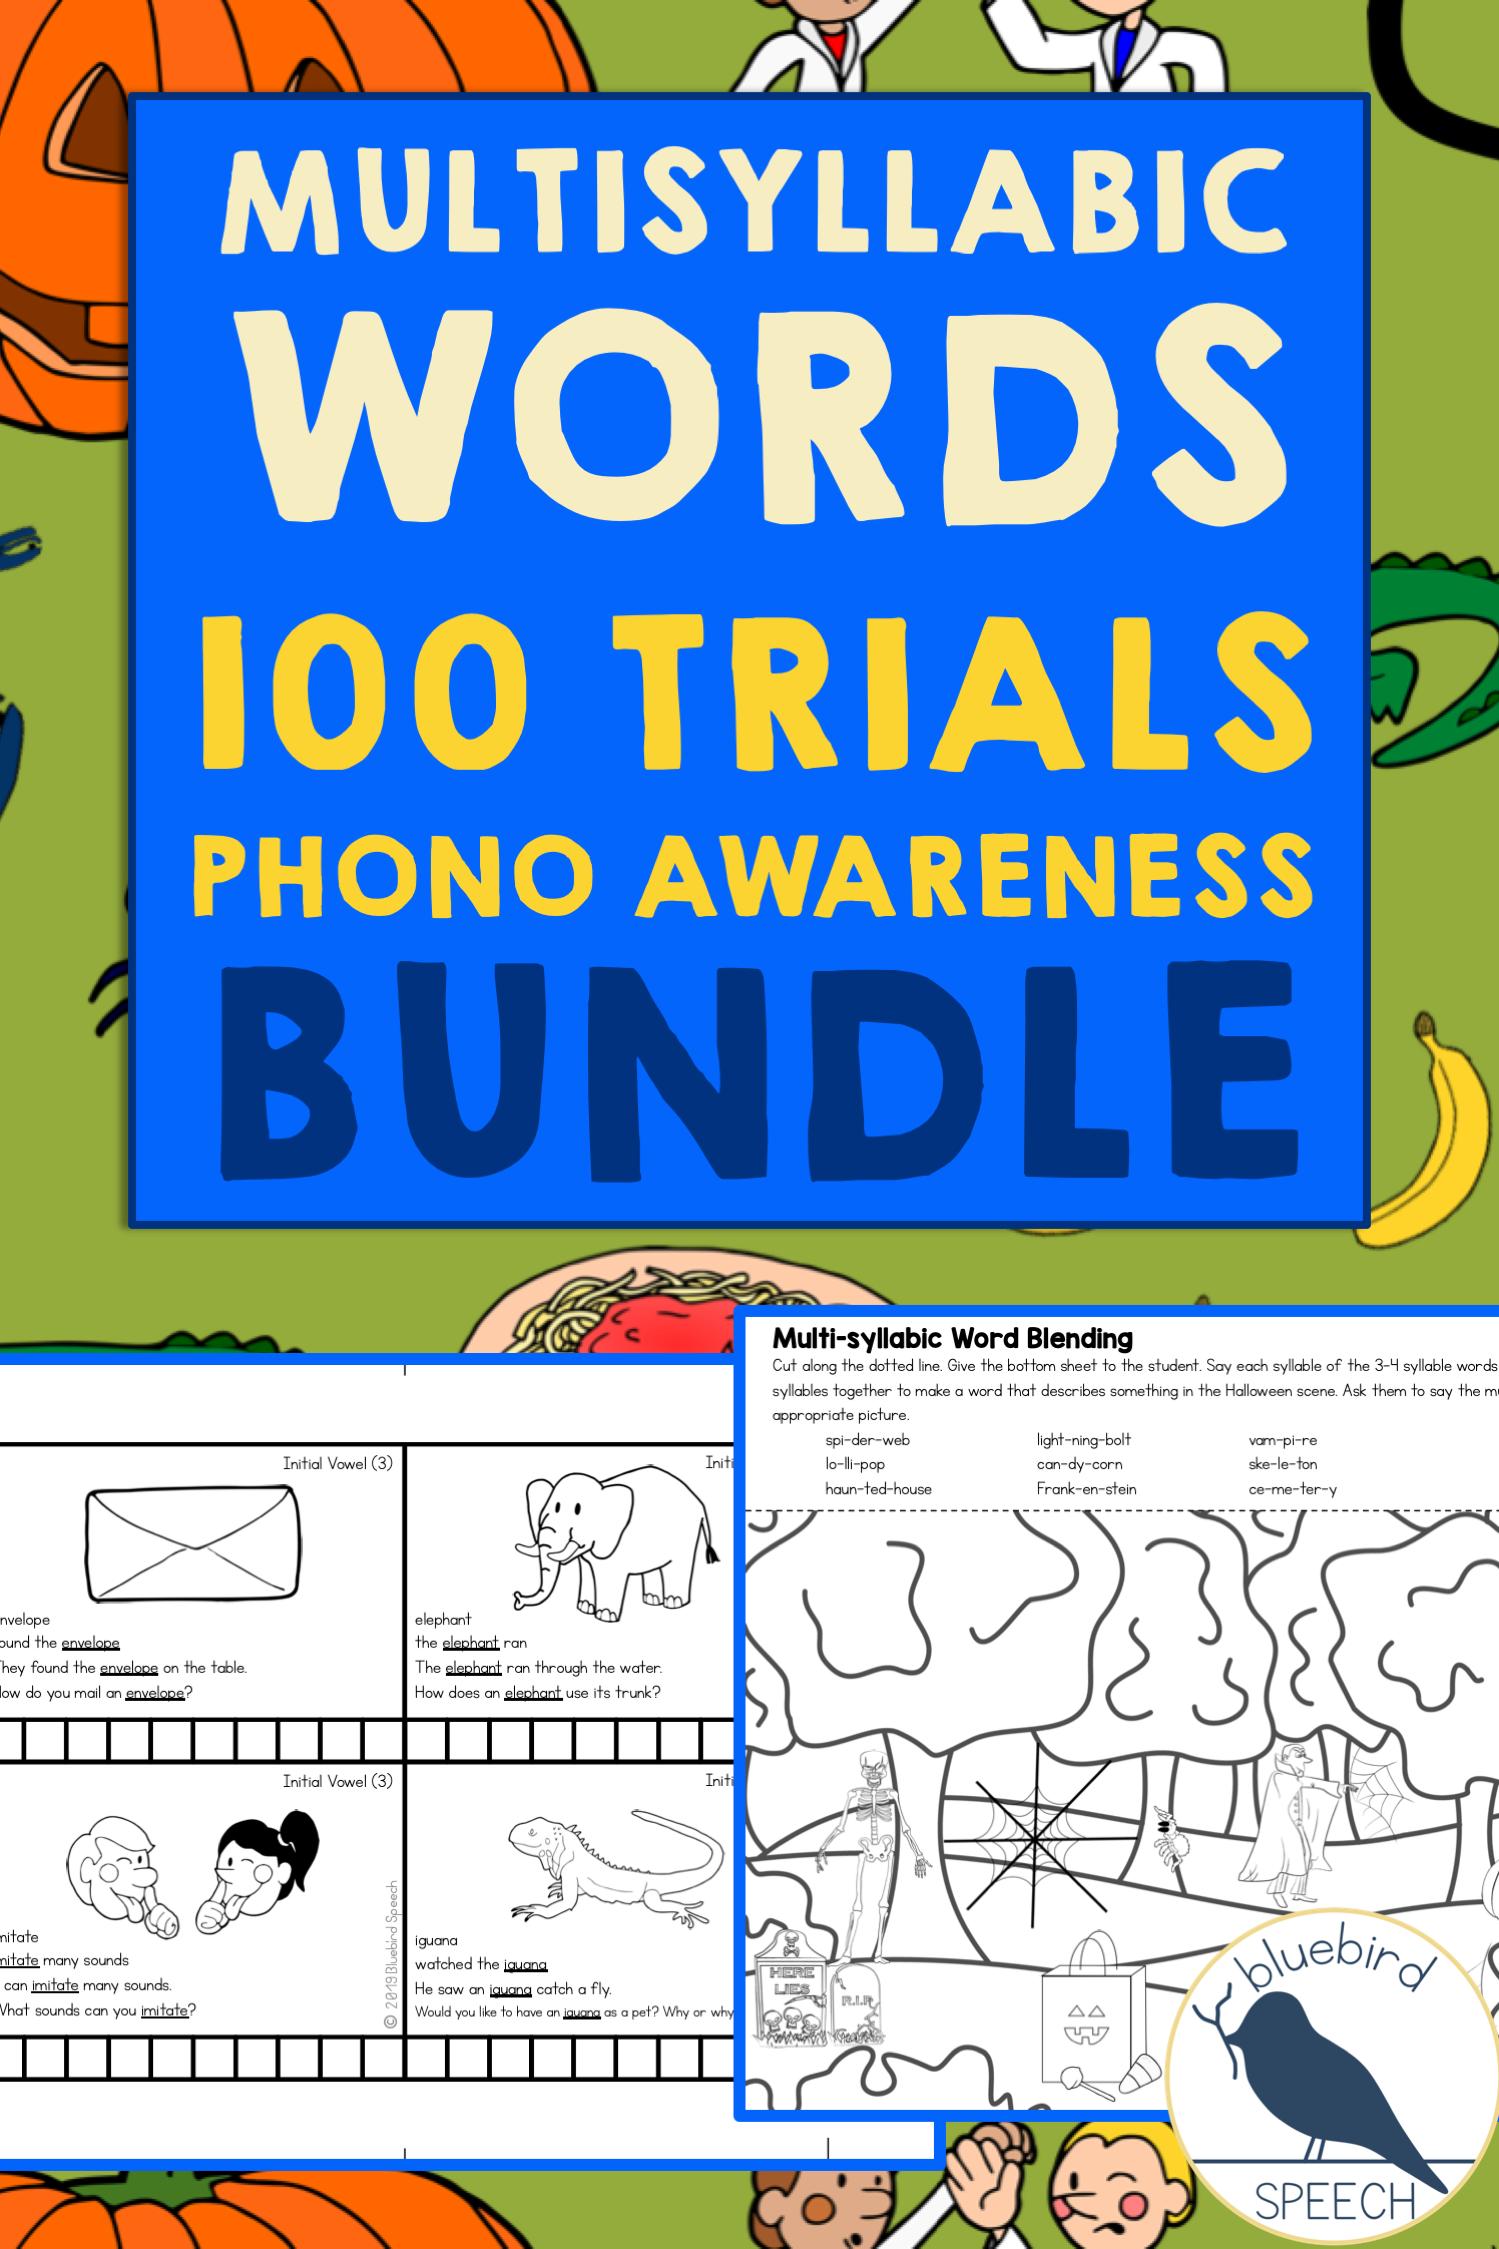 Bundle Multisyllabic Word Practice In Speech Therapy